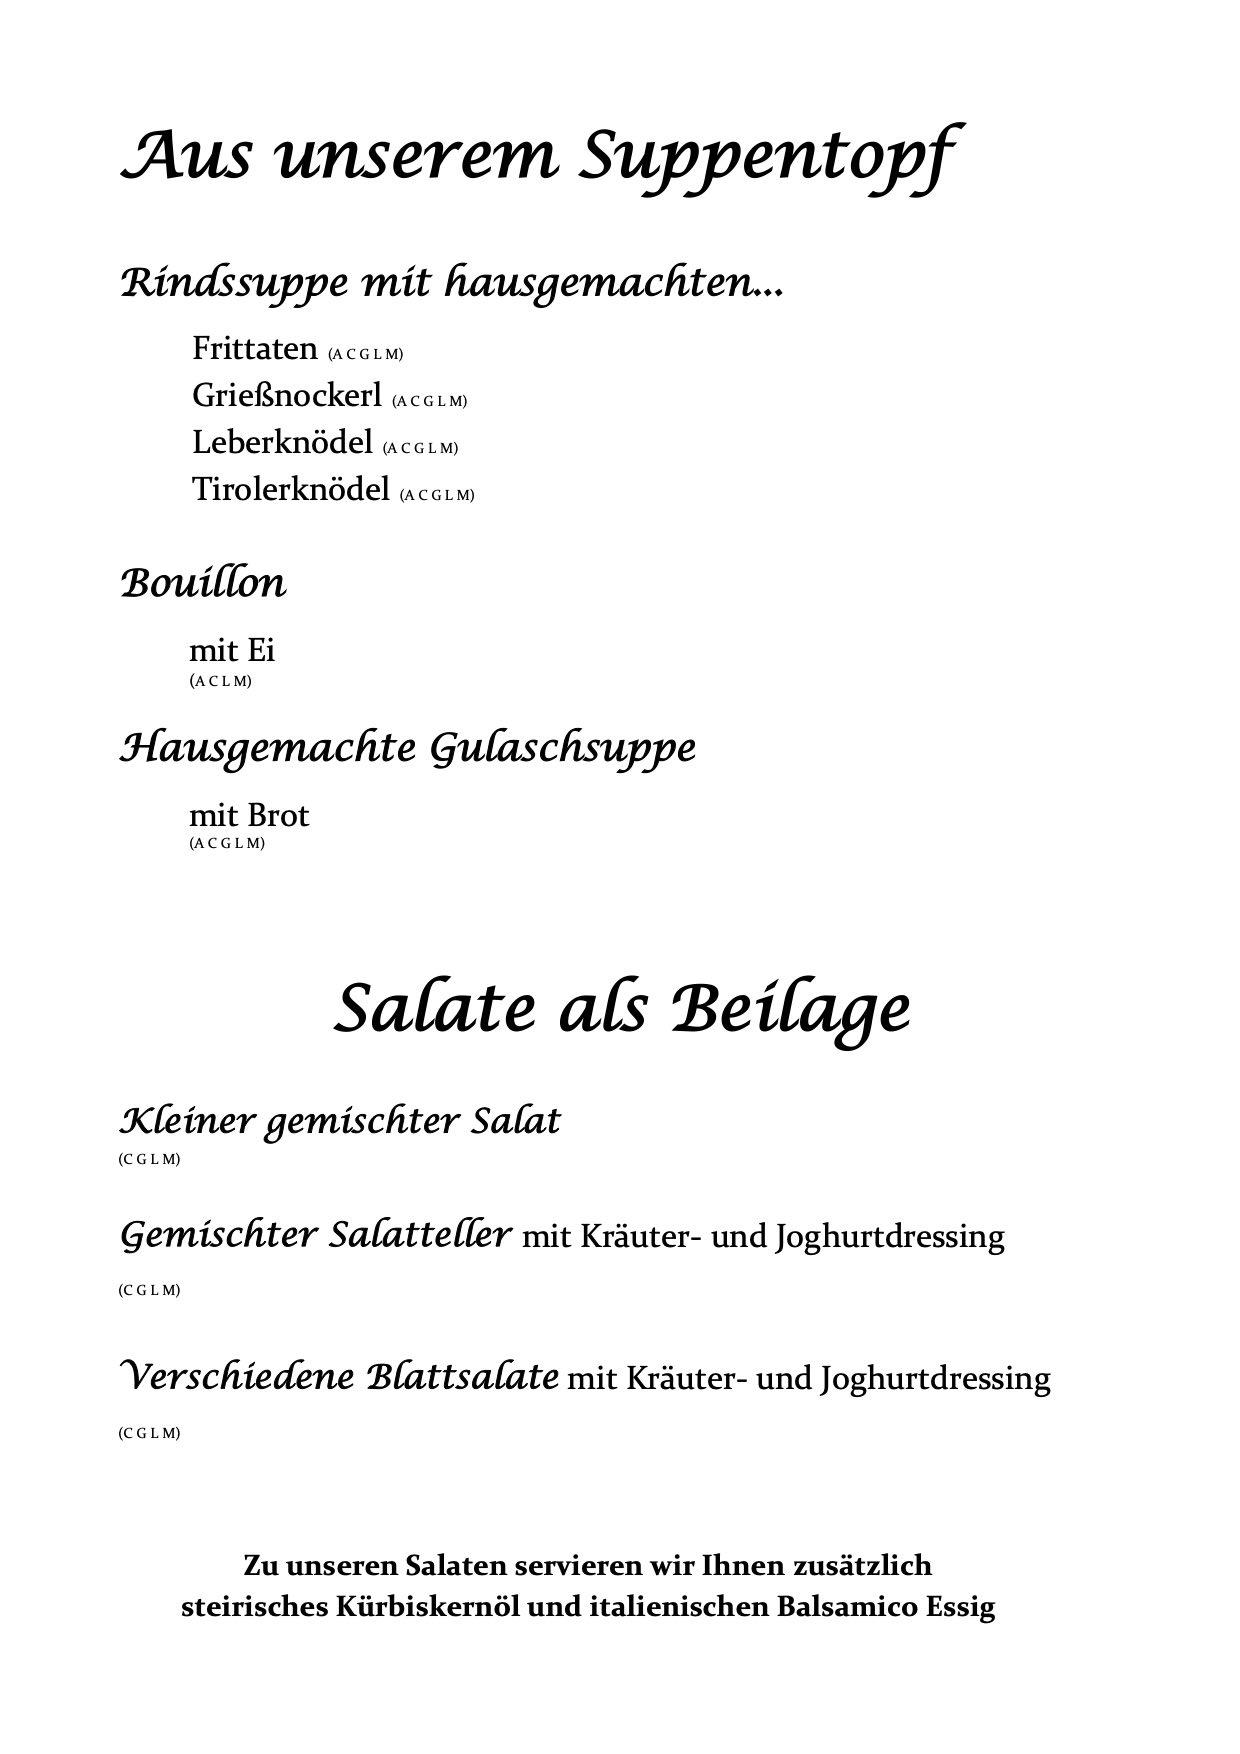 Speisekarte Mascha Wirt Suppen Salate